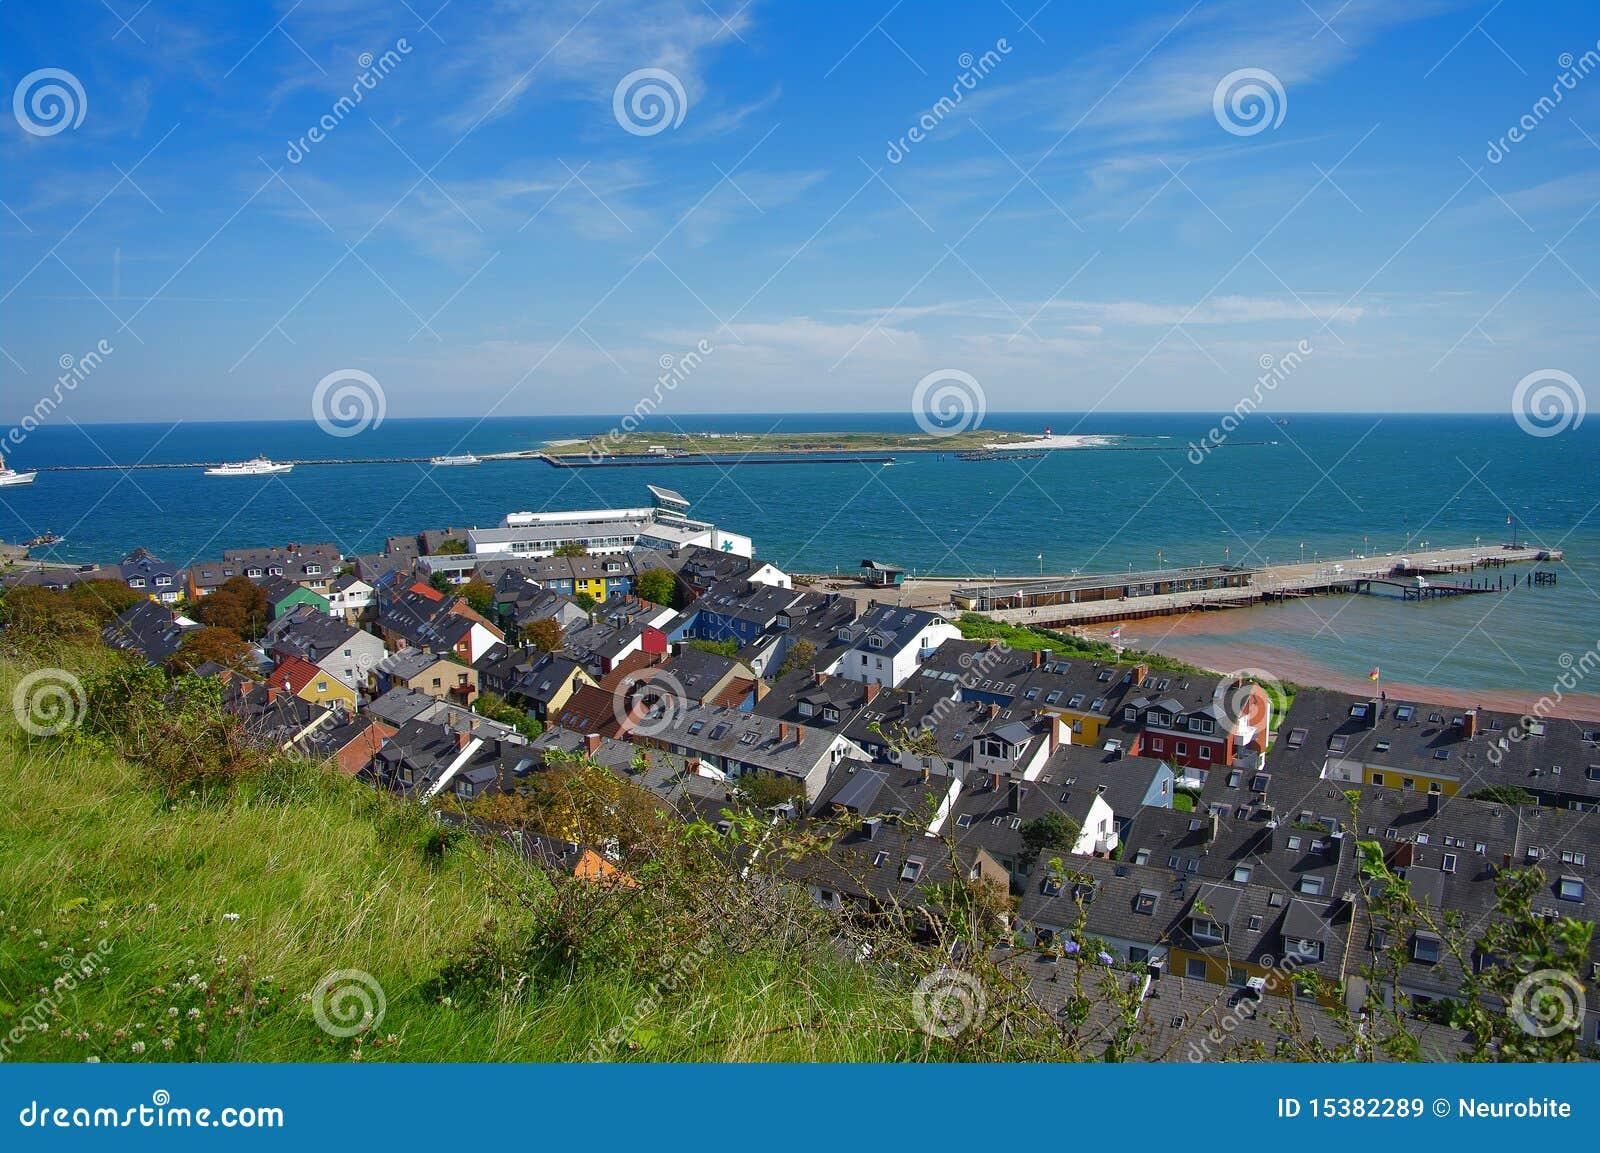 Helgoland island in germany hotels royalty free stock for Designhotel helgoland